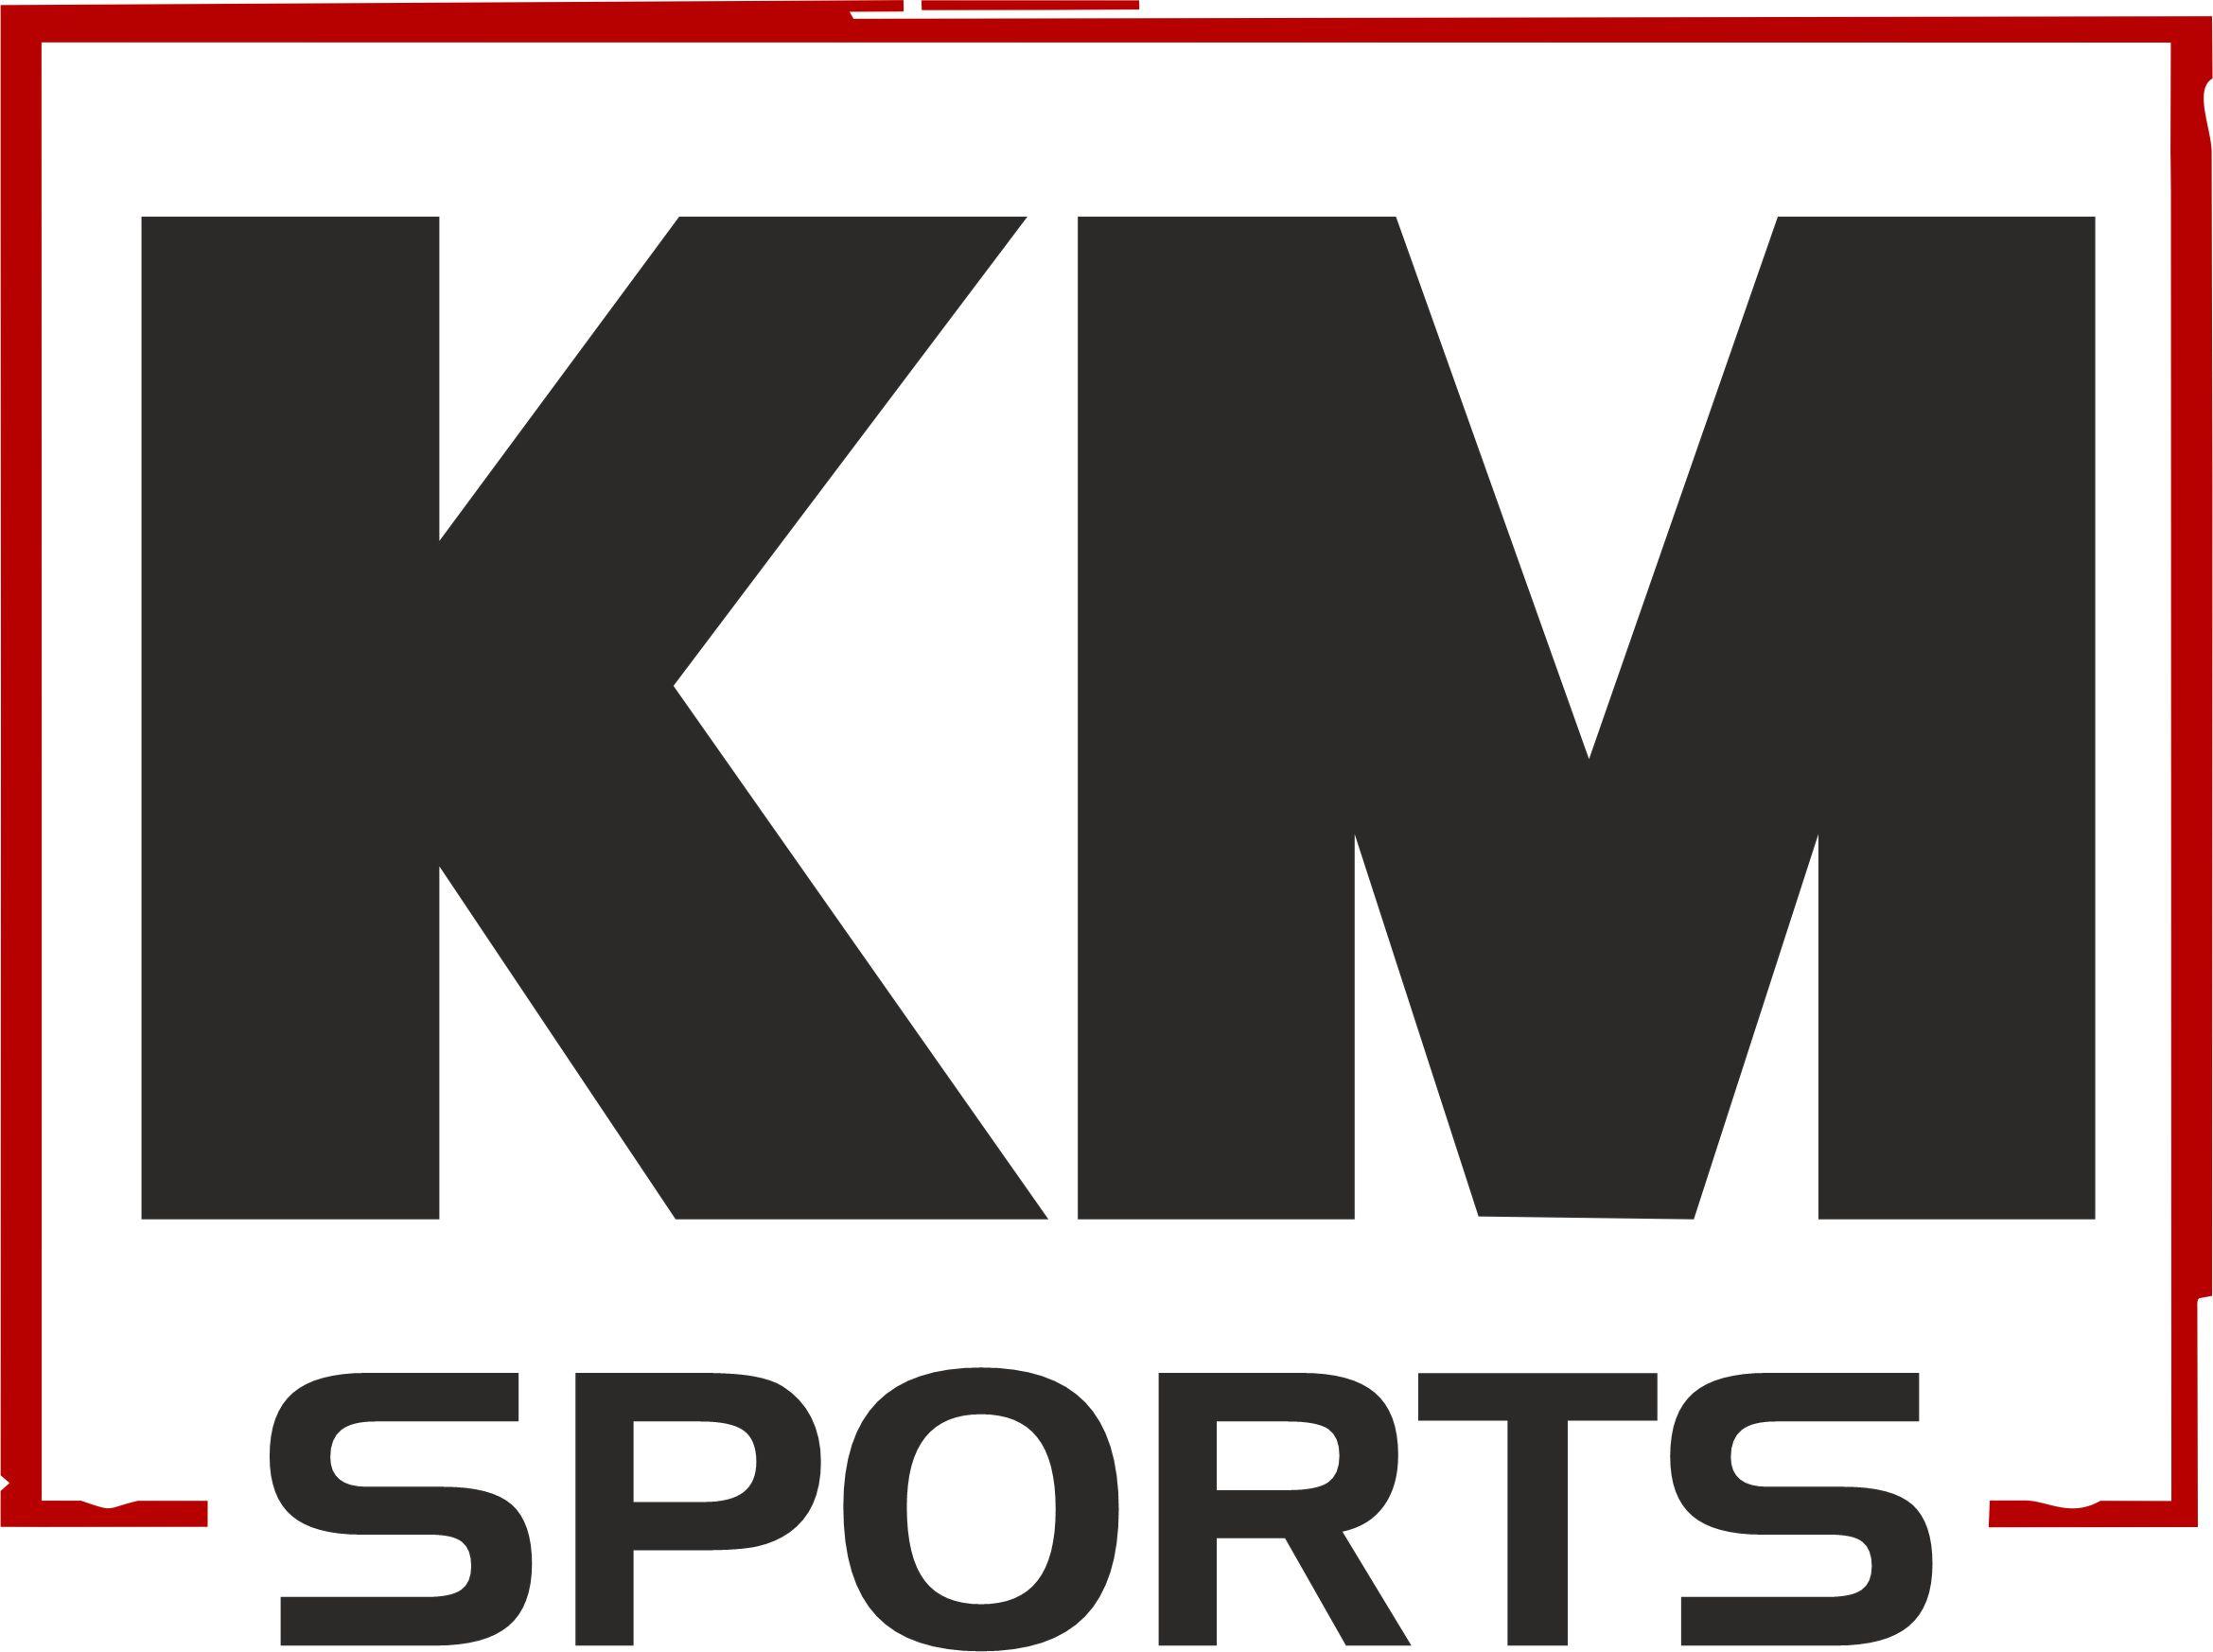 Krav Maga sports